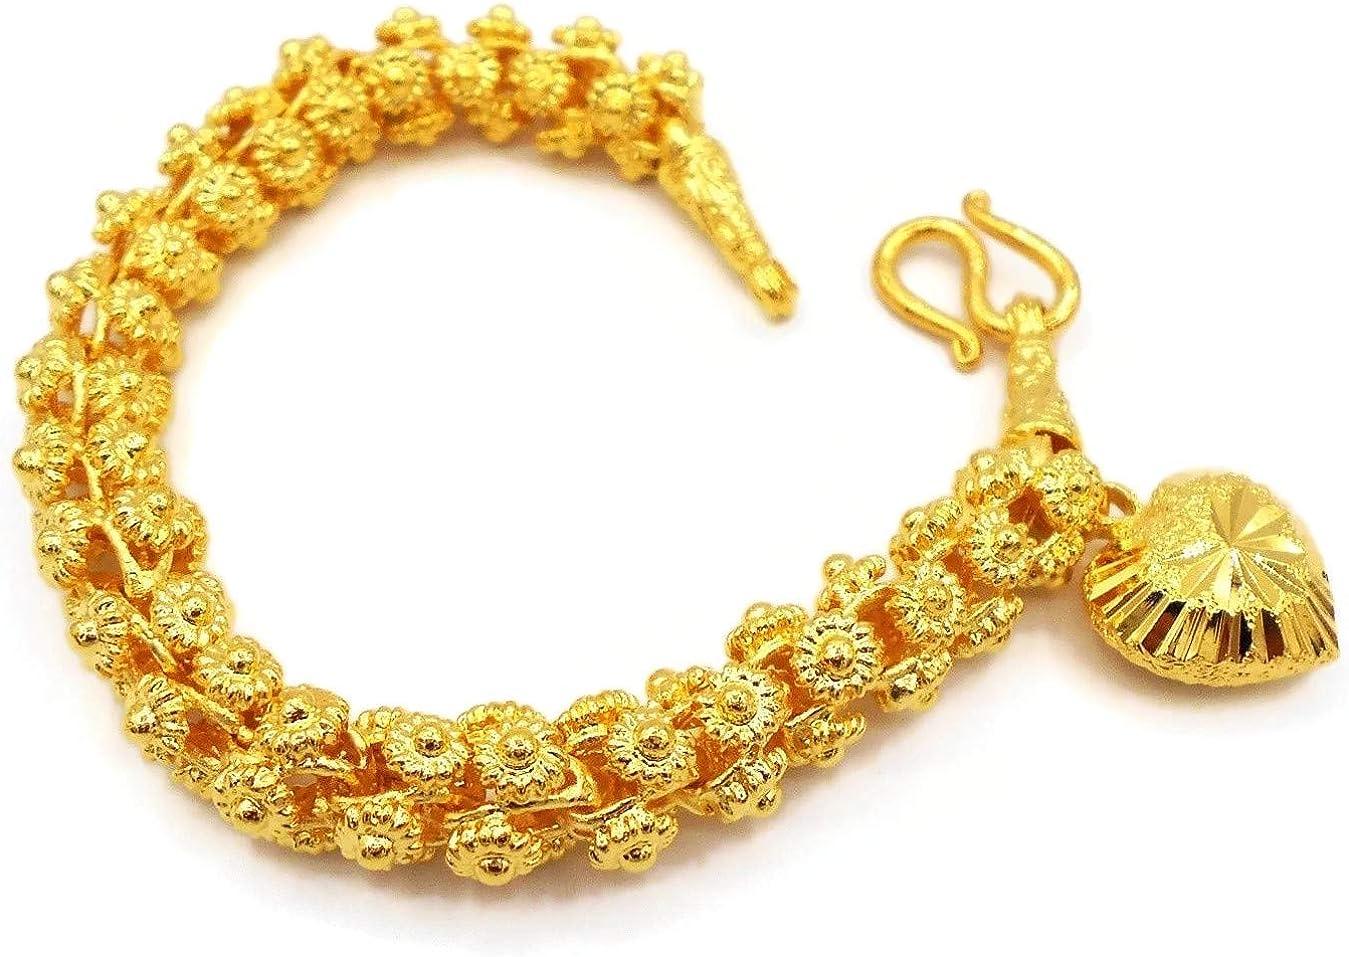 Heart Pikun Flower Lai Thai Gold Plated Bangle 22k 24k Thai Baht Yellow Gold Filled Bracelet Jewelry Women